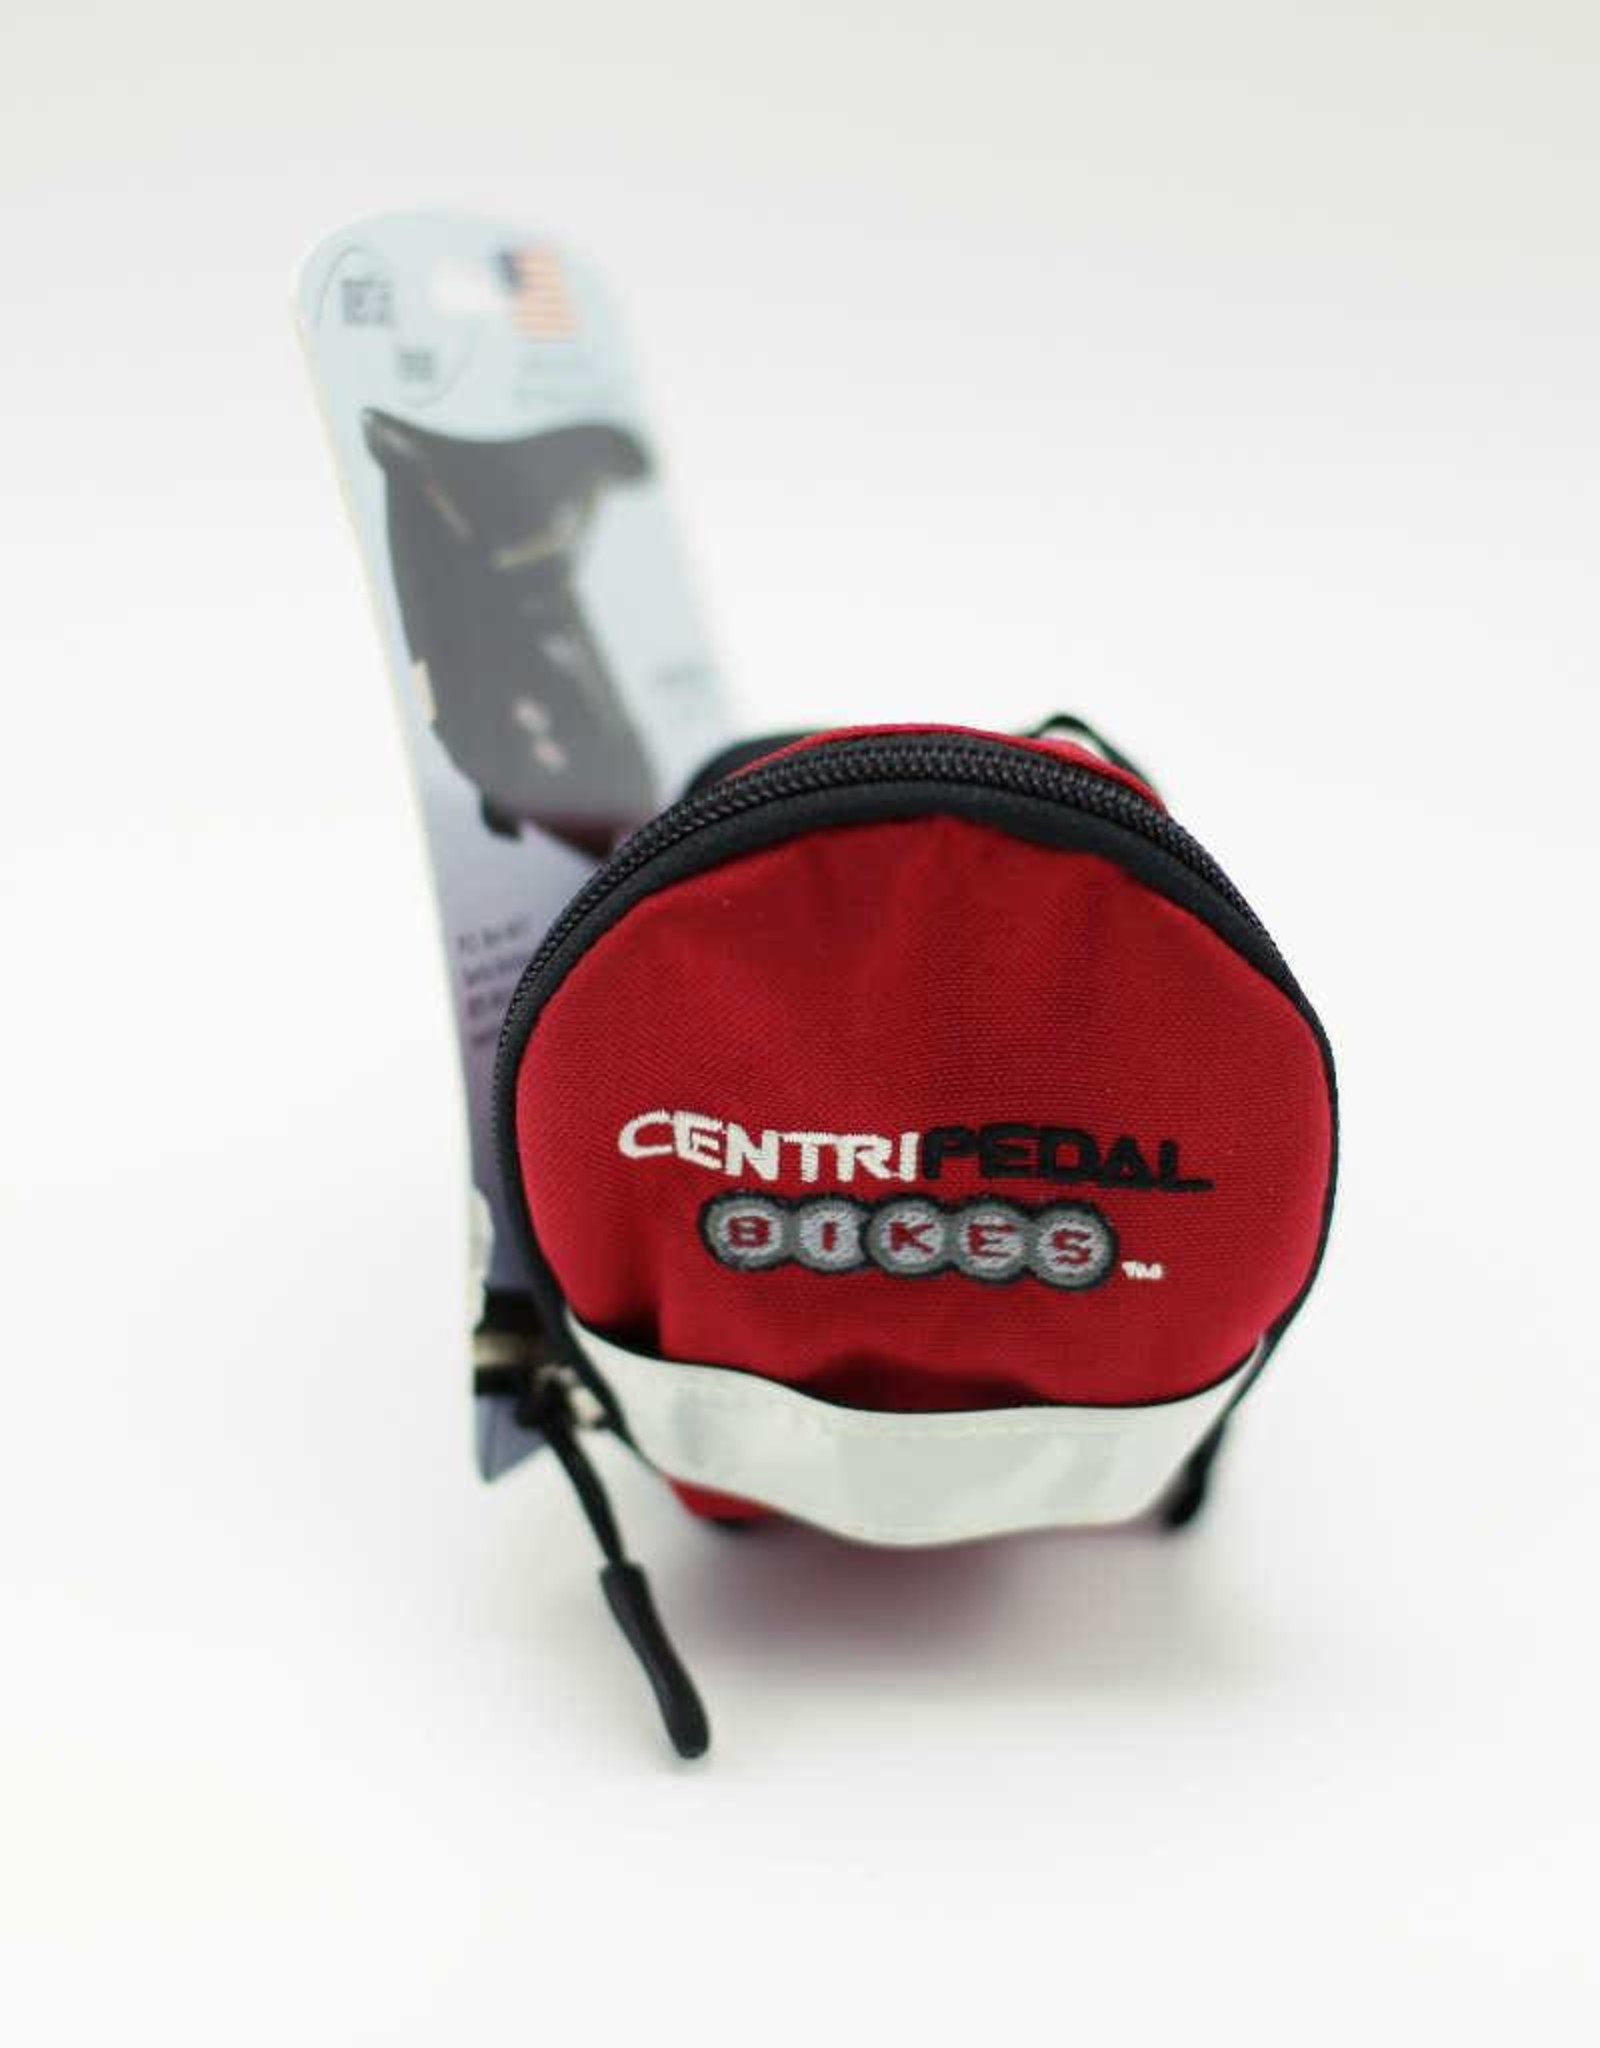 Inertia Designs CentriPEDAL Cargo Wedge 2 Saddle Bag